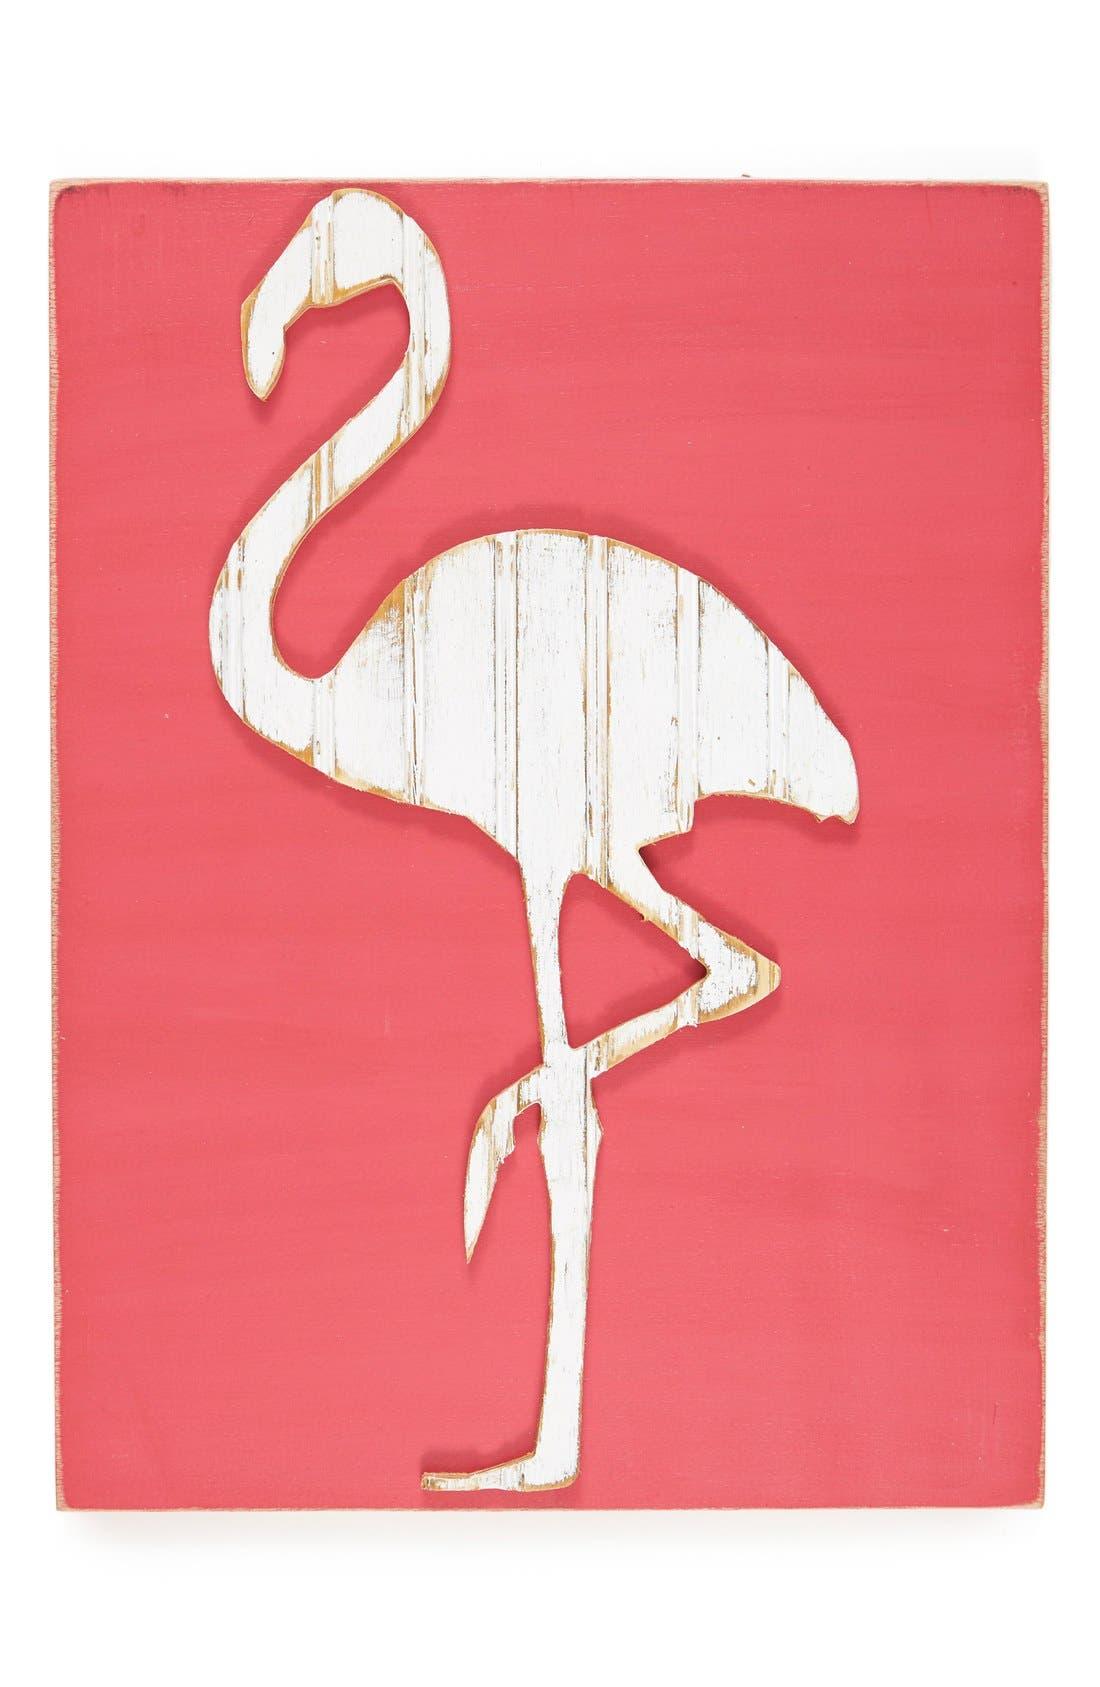 distressed wood wall art contemporary flamingo distressed wood wall art grace graffiti art nordstrom